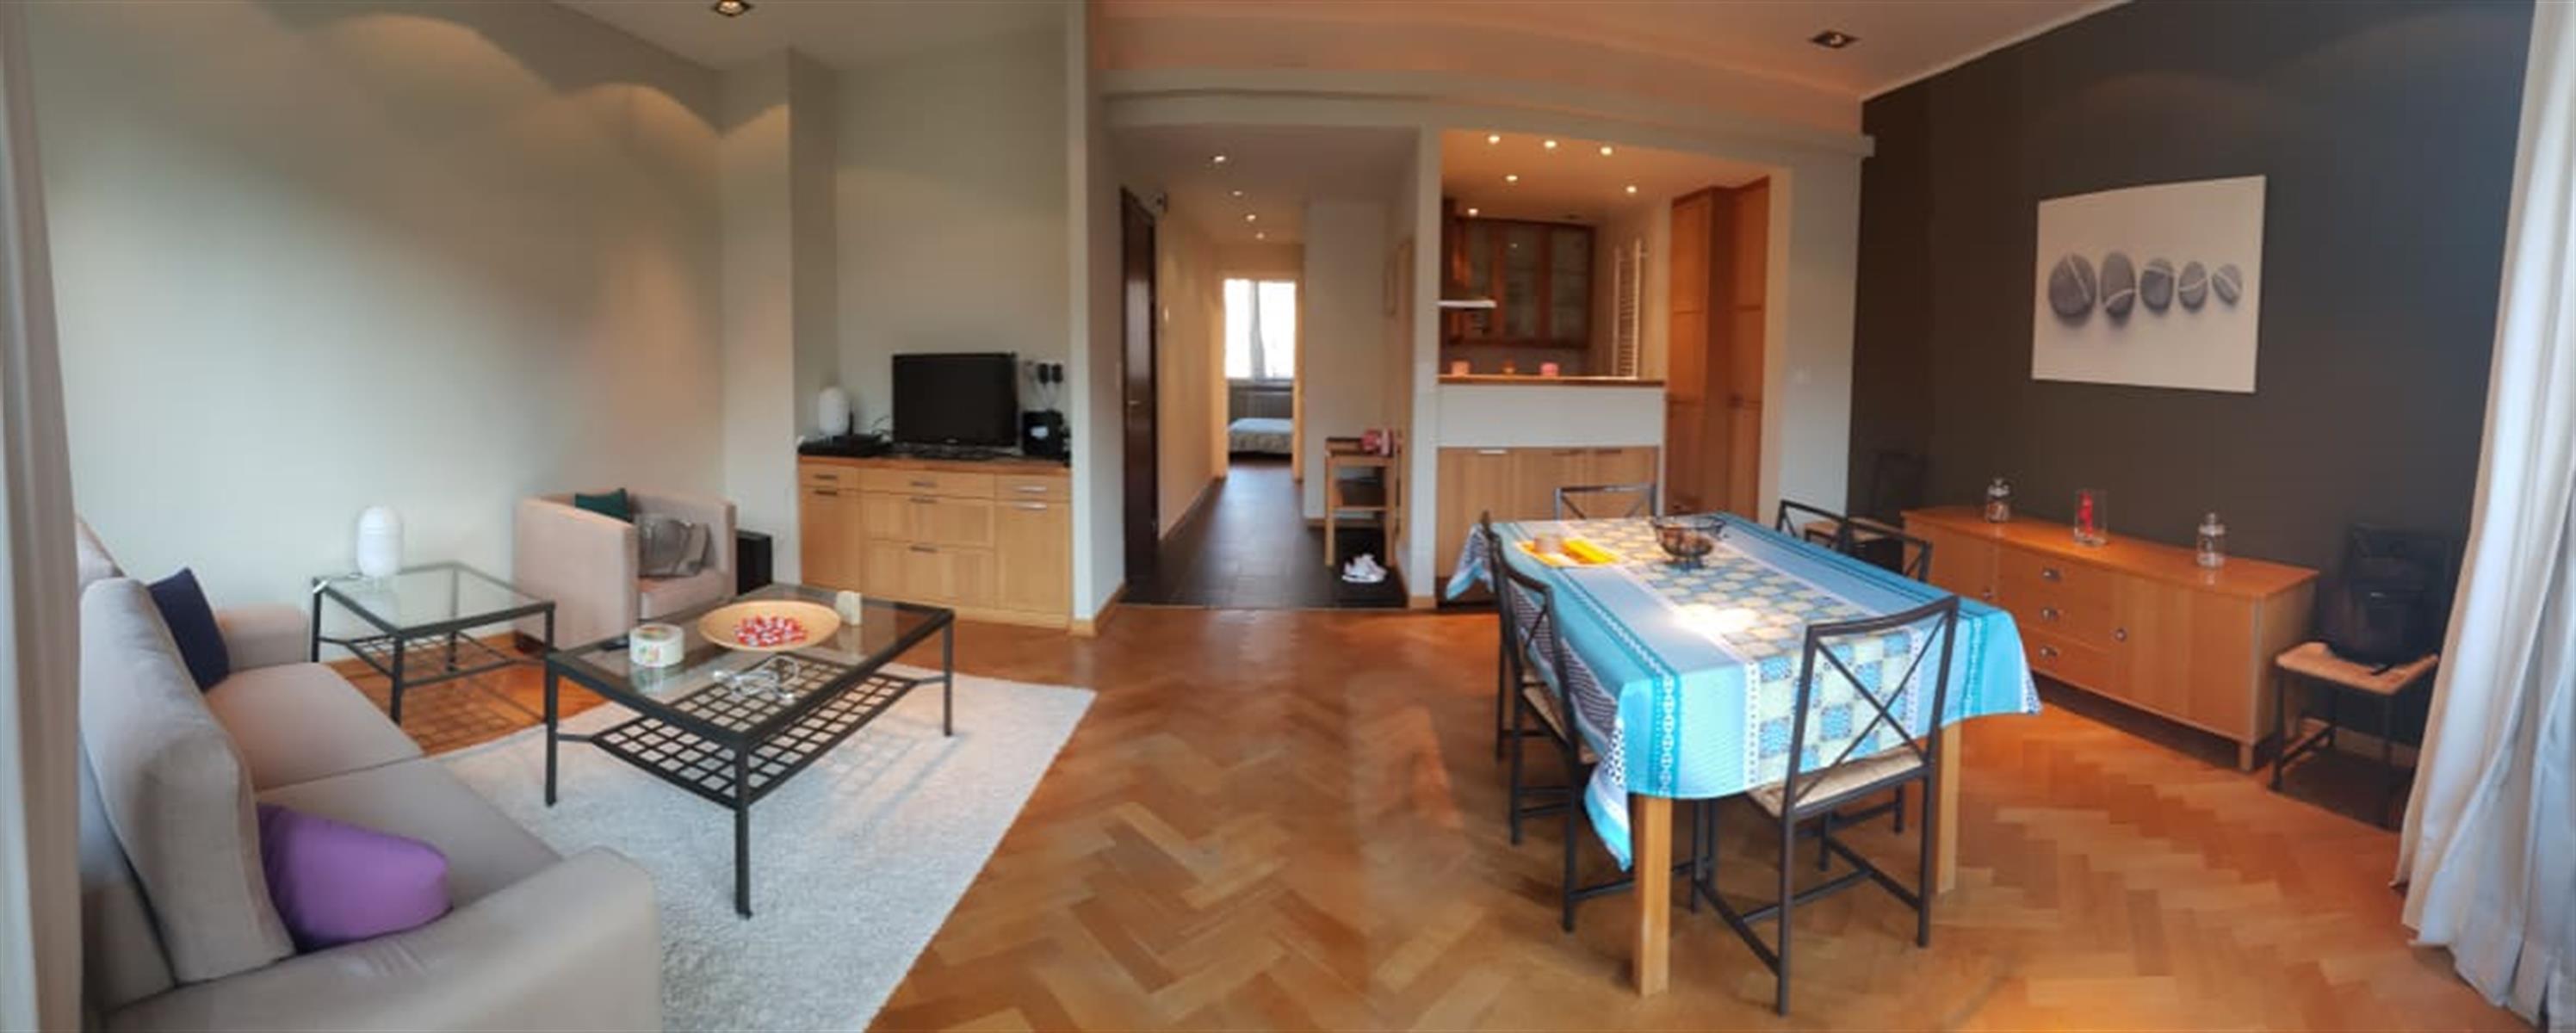 Appartement - Woluwe-Saint-Lambert - #4162898-6